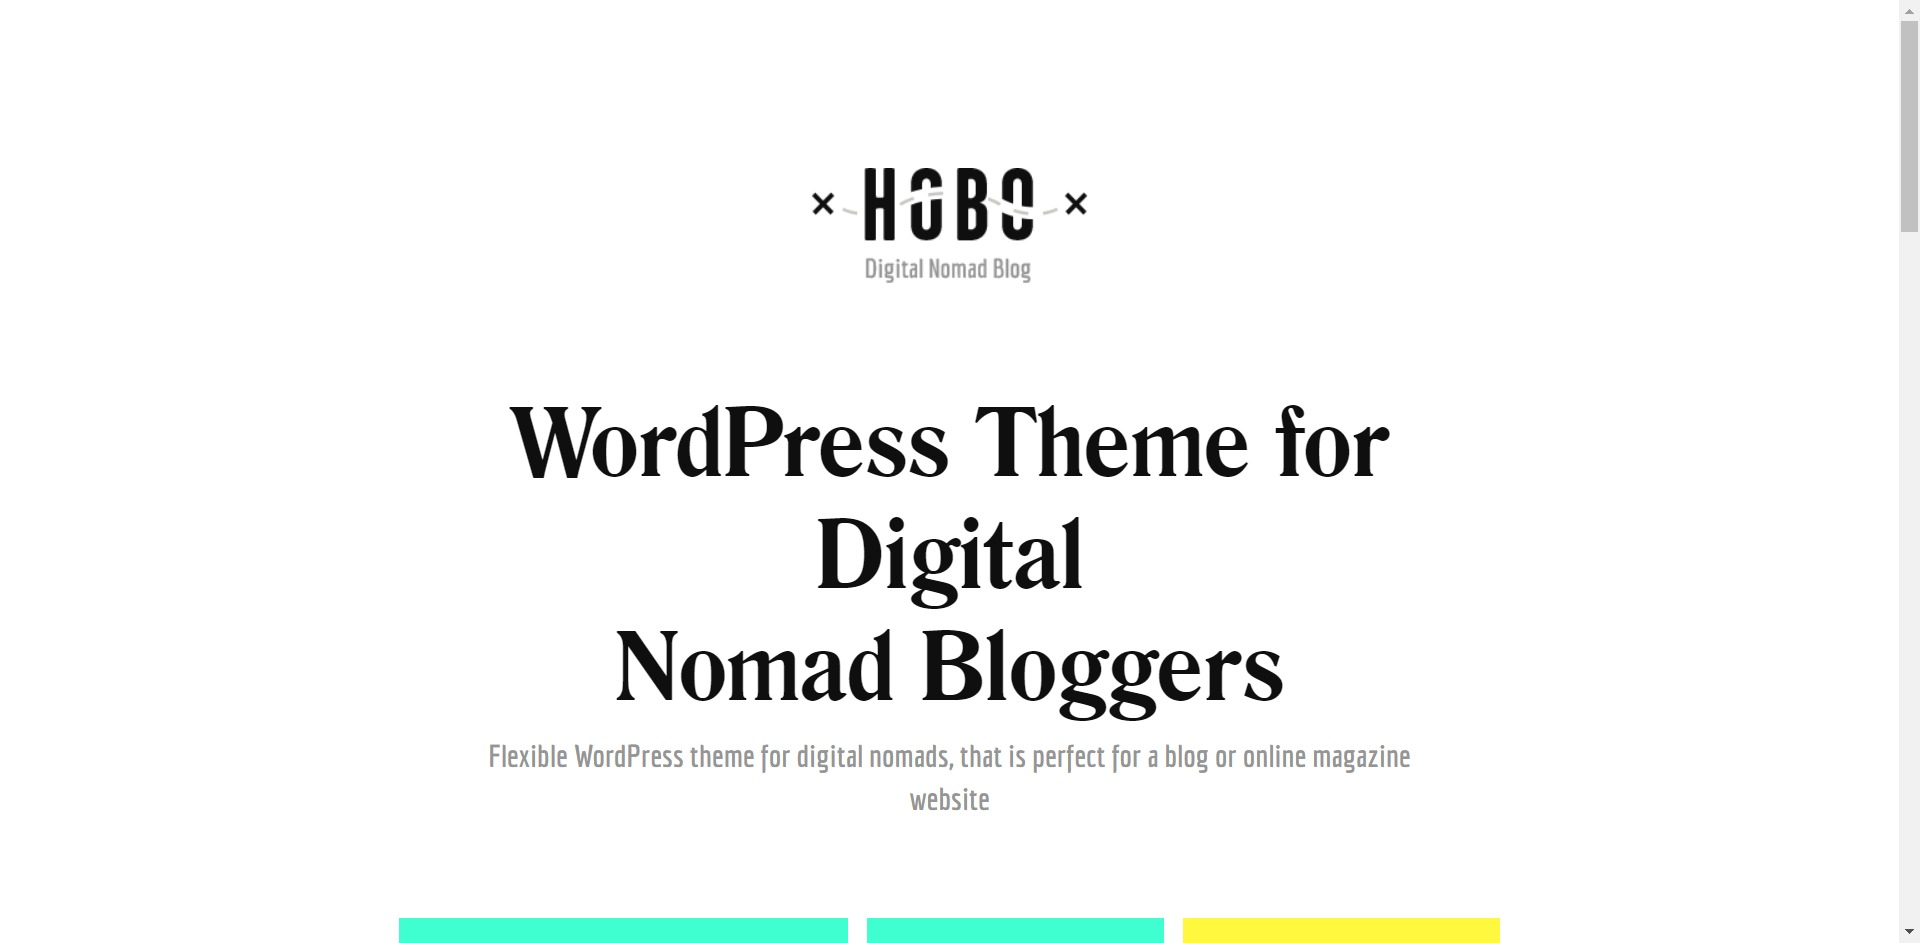 Hobo-网红打卡旅游生活日志博客WordPress主题